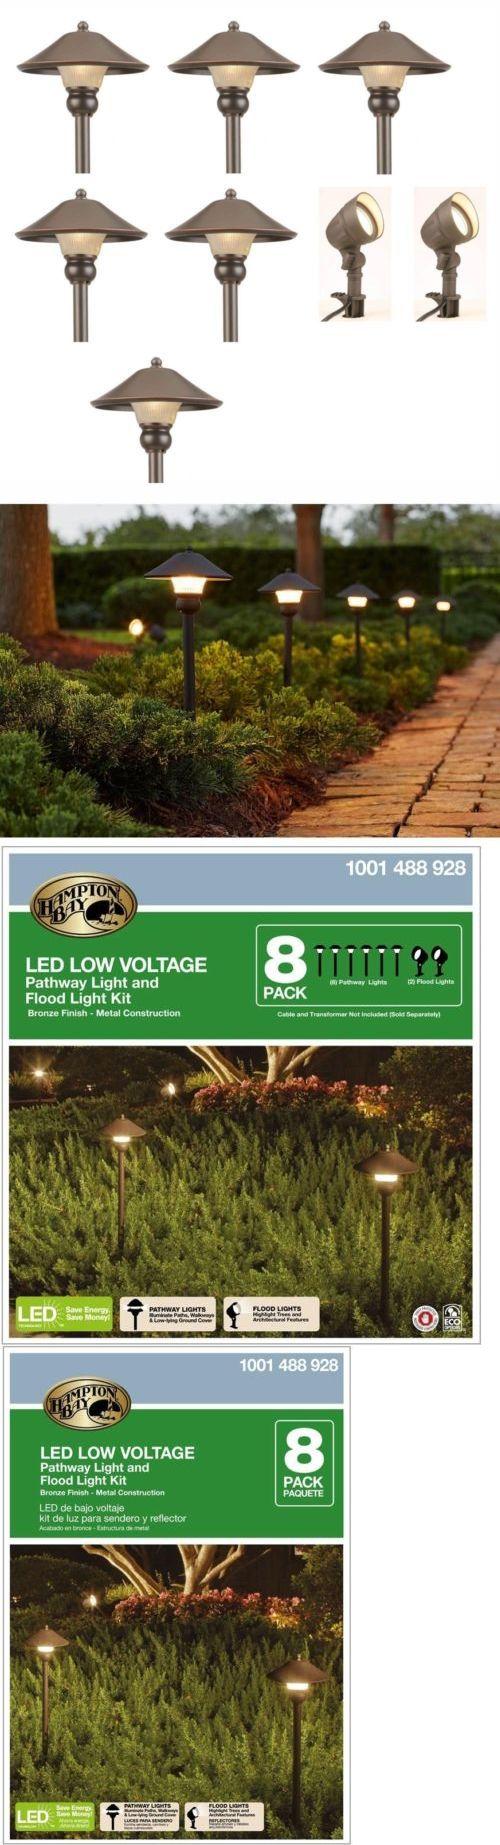 Solar power round recessed deck dock pathway garden led light ebay - Farm And Garden Led Outdoor Low Voltage Path Walkway Garden Landscape Lighting Kit Lights 8